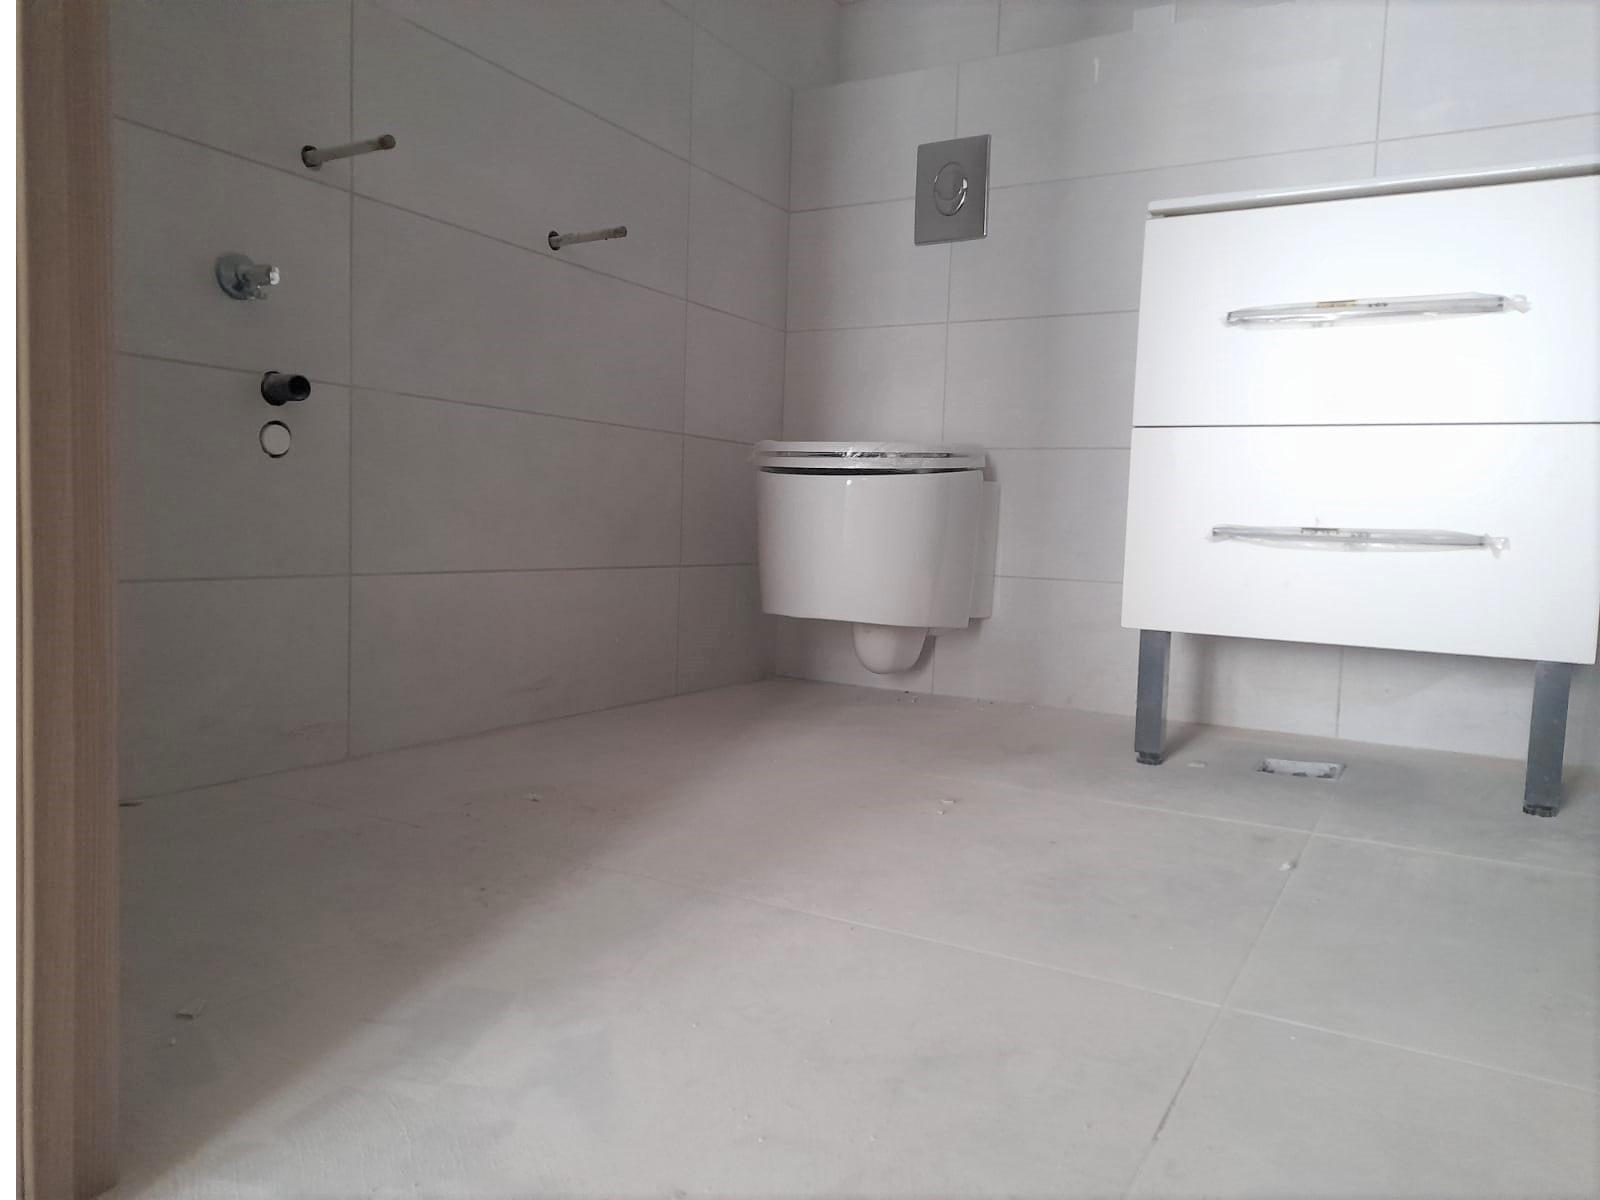 baie, vas de toaleta